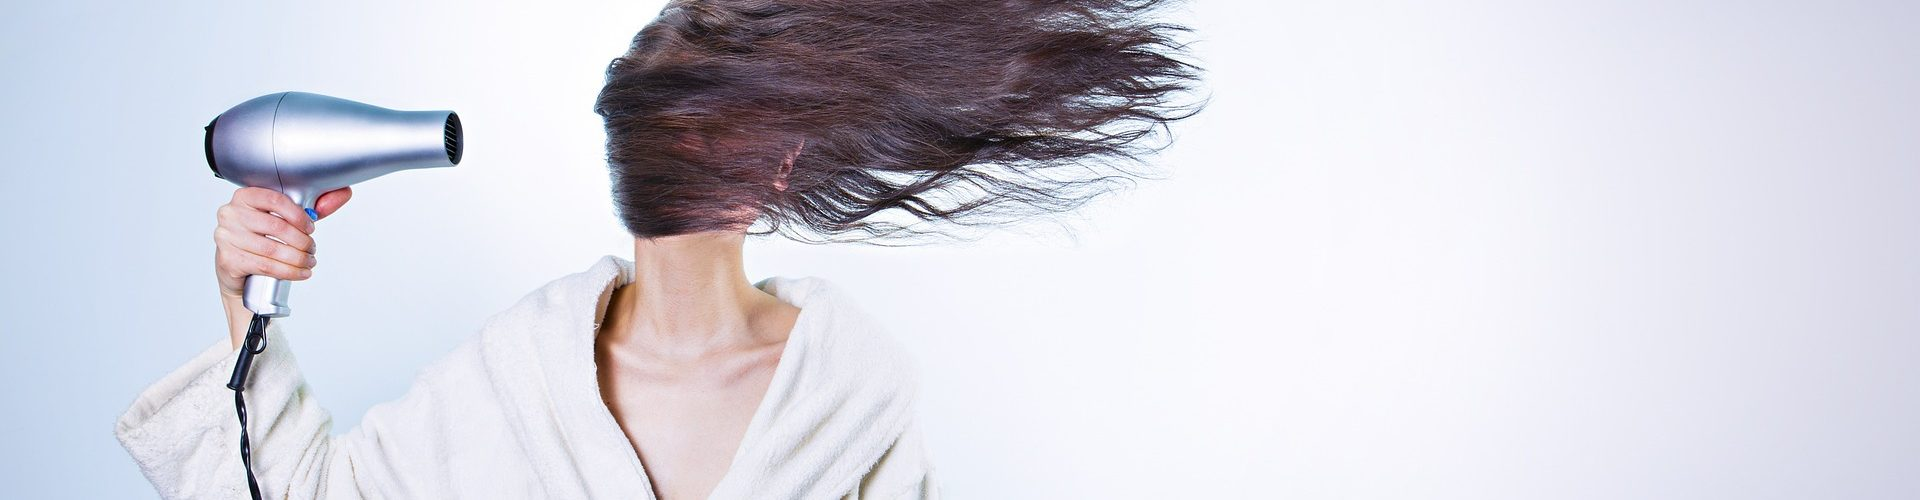 Brazen Loves: Revlon Professional Uniqu 10 All-in-One Hair Treatment